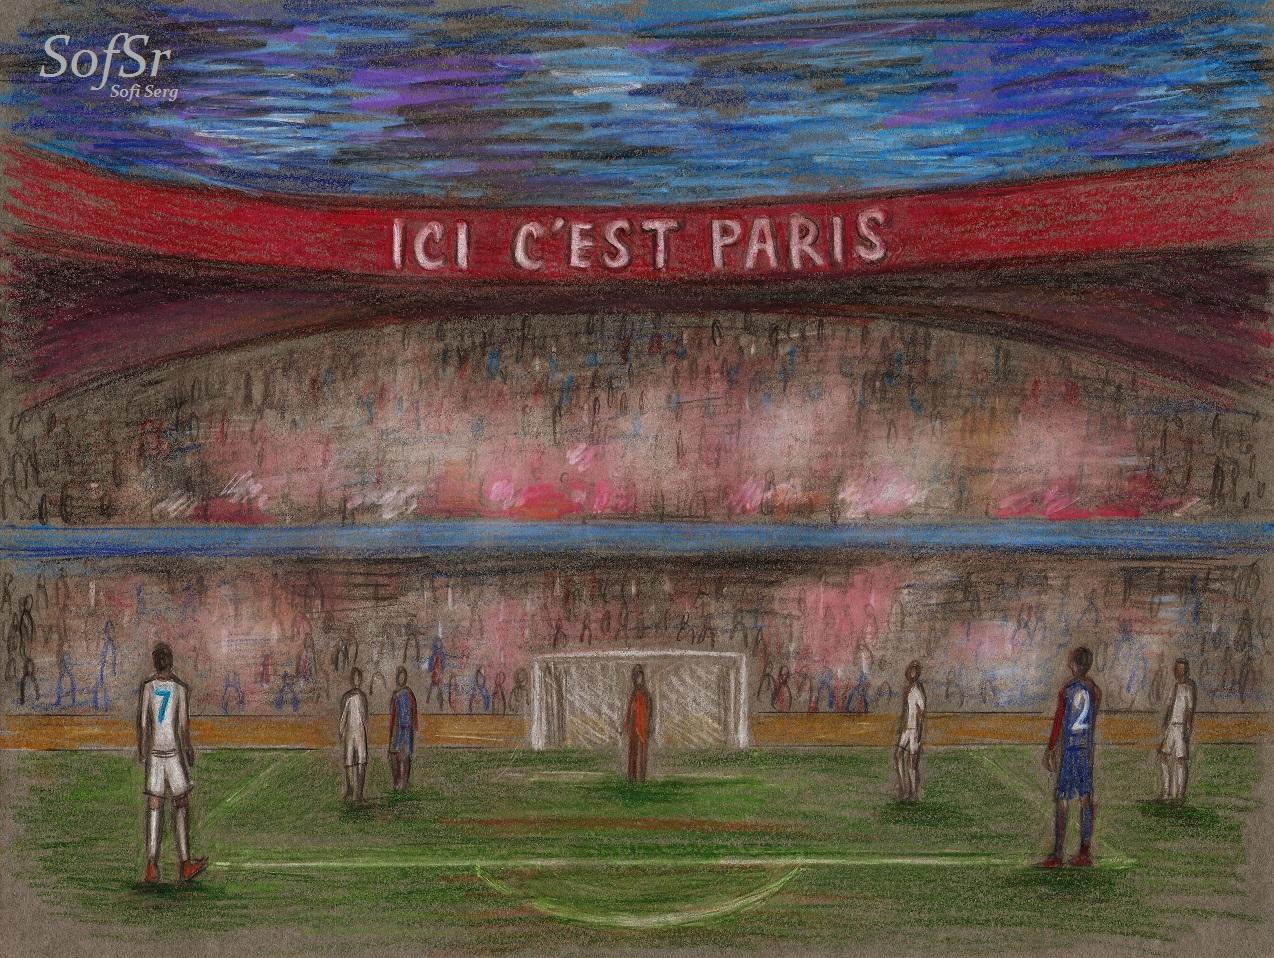 PSG vs Real Madrid. Illustration by Sofi Serg.